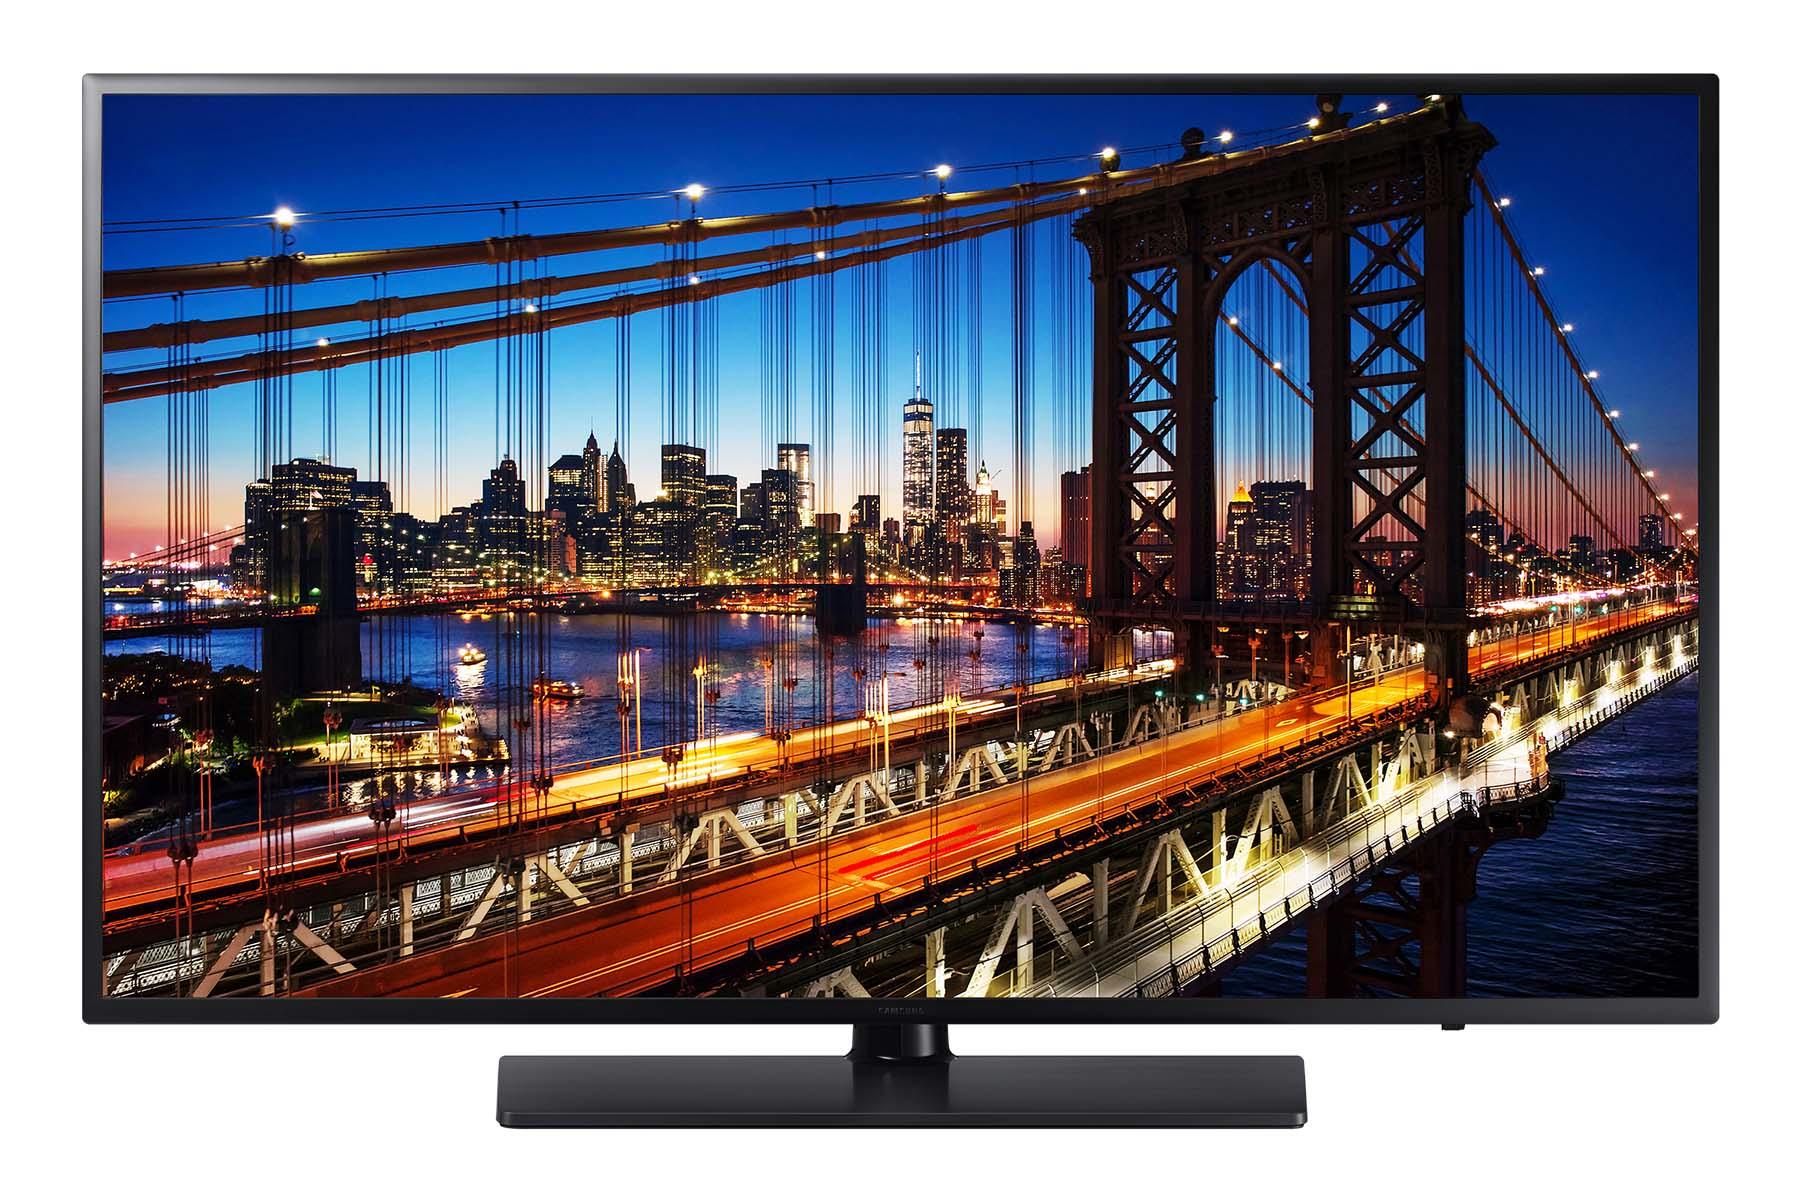 Samsung Samsung HG43EF690DB TV Hospitality 109,2 cm (43